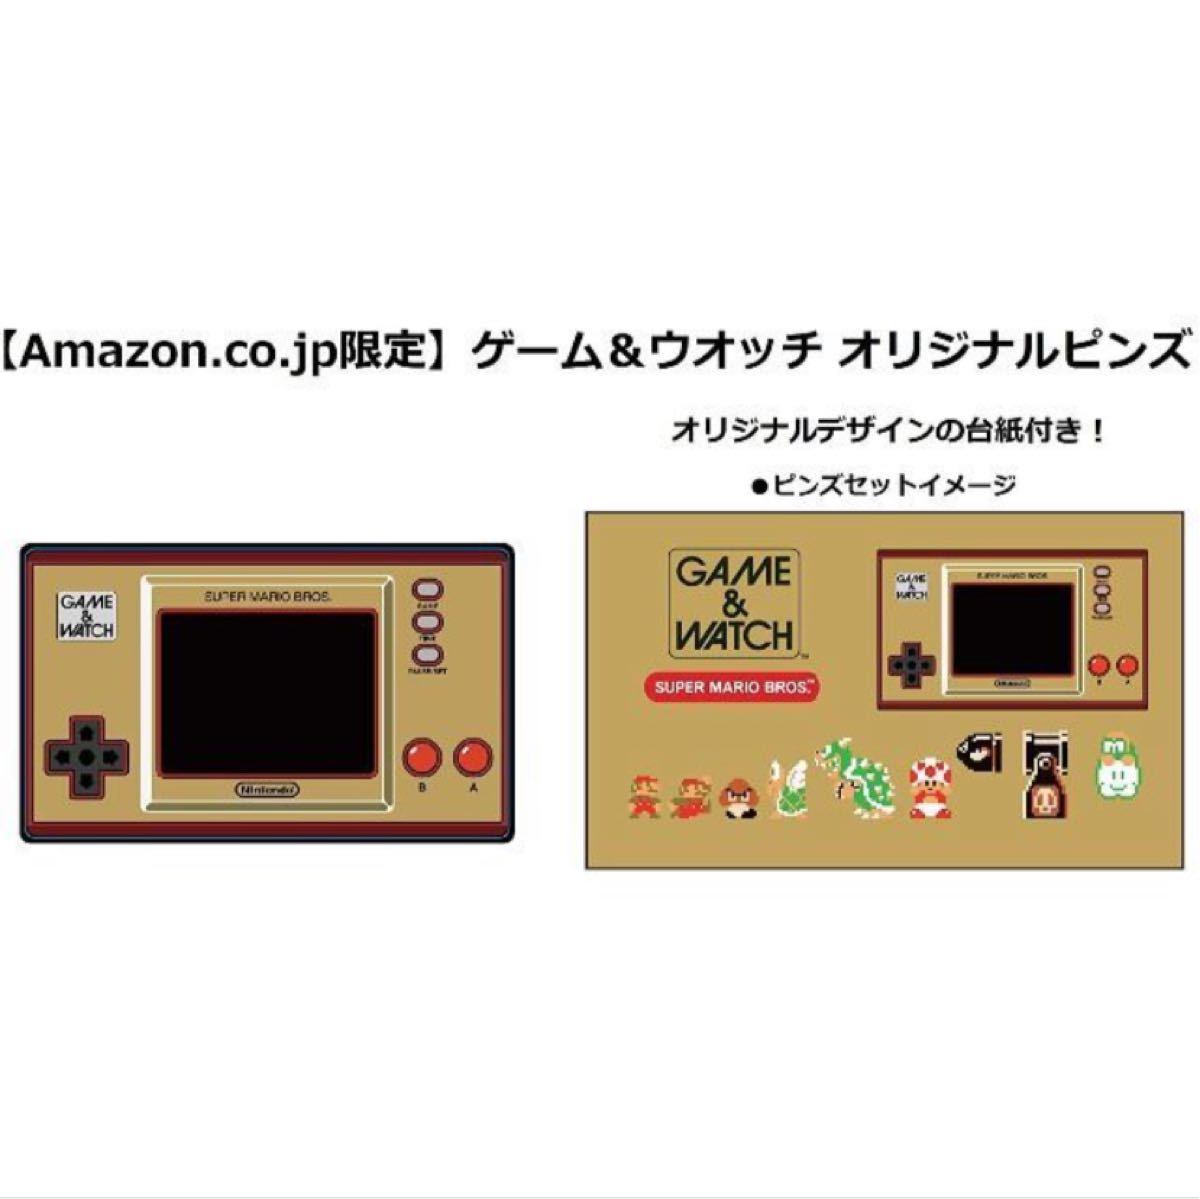 Amazon.co.jp限定 ゲーム&ウオッチ スーパーマリオブラザーズ オリジナルピンズ同梱 新品未使用未開封品